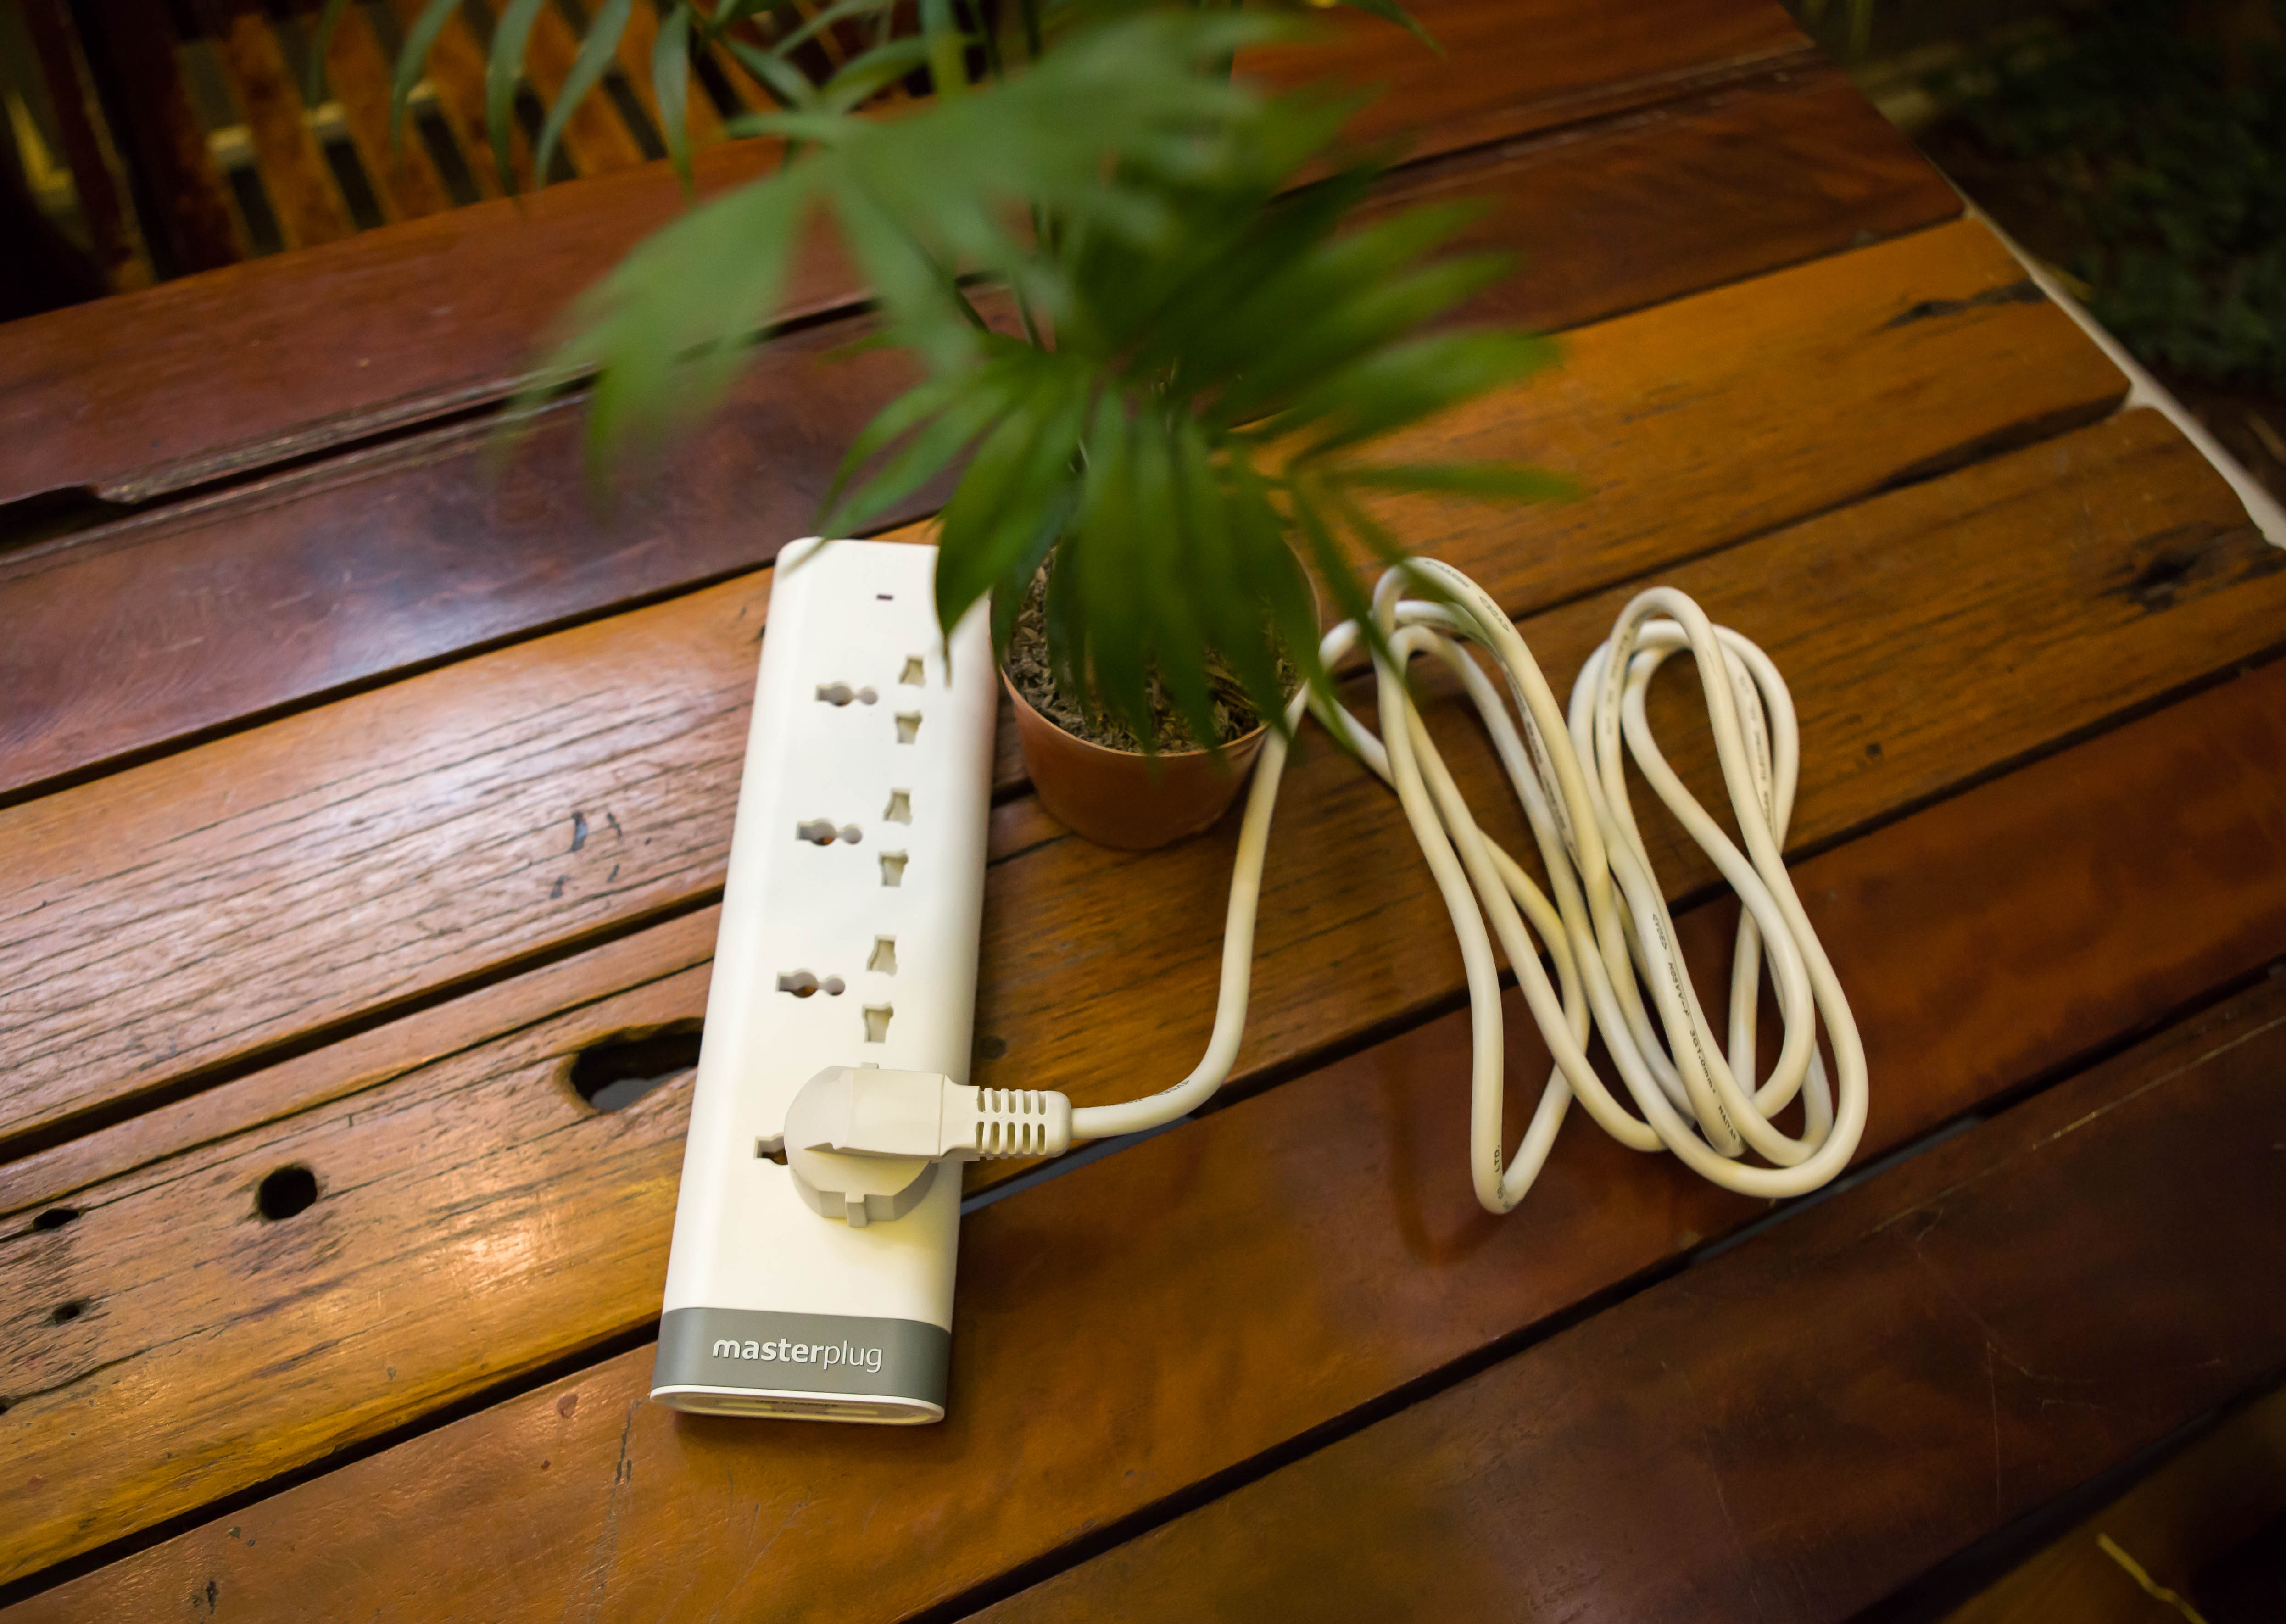 Ổ cắm 4 lỗ tích hợp Smart USB MasterPlug E4030U